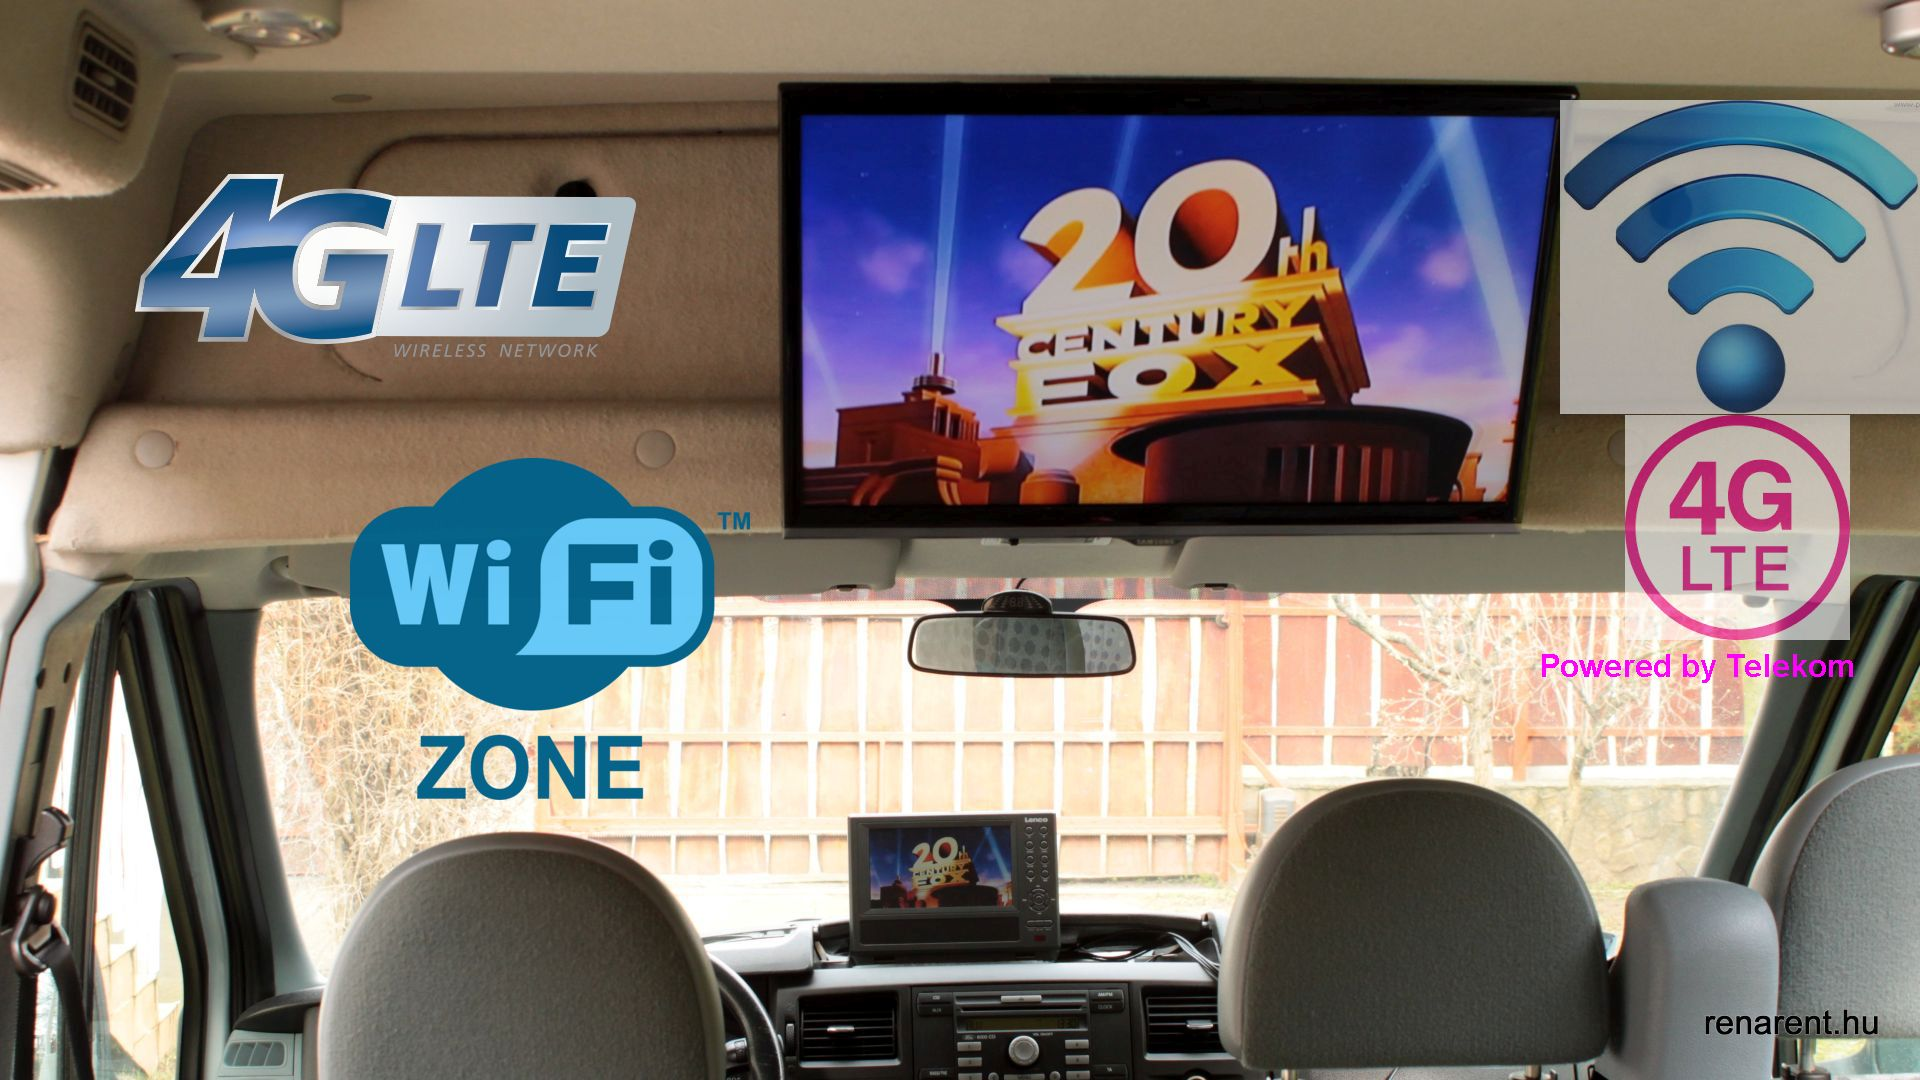 FT_TV_20CF_wifi